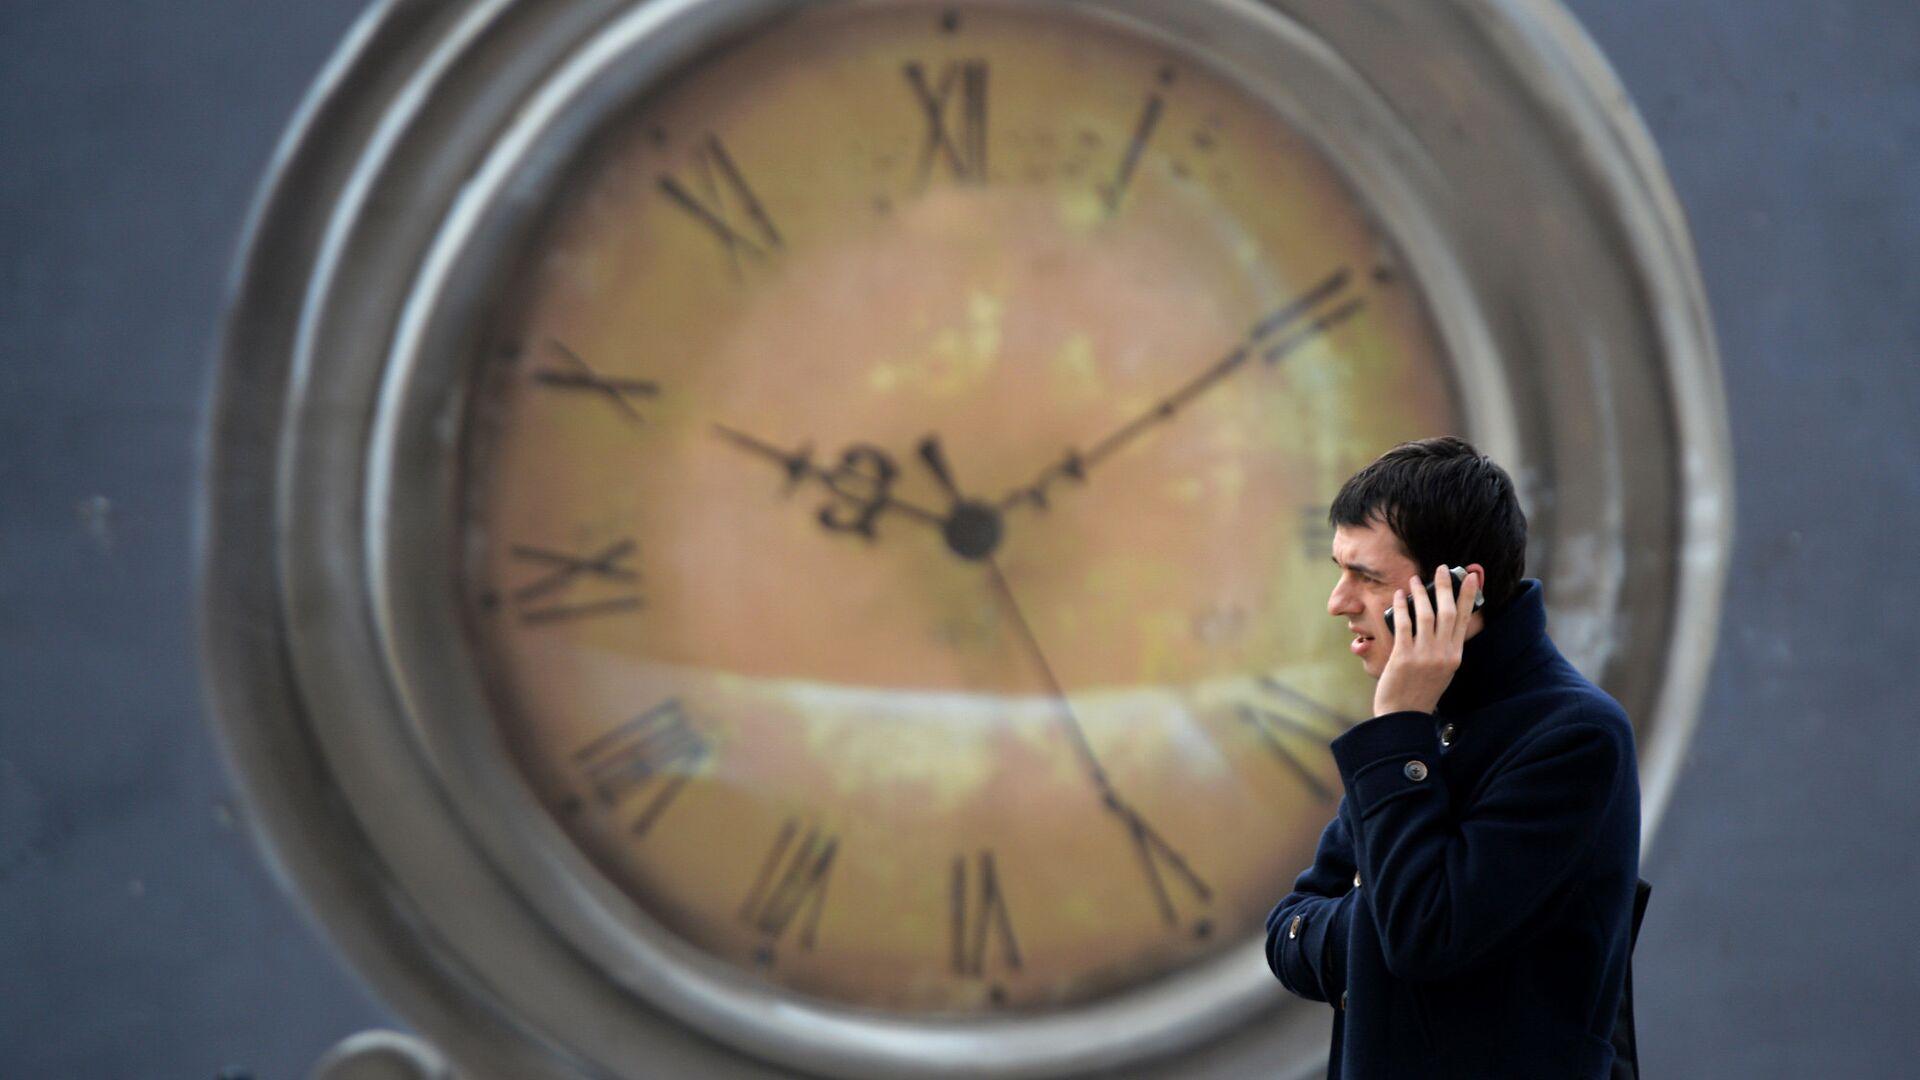 Мужчина разговаривает по телефону - РИА Новости, 1920, 13.01.2021